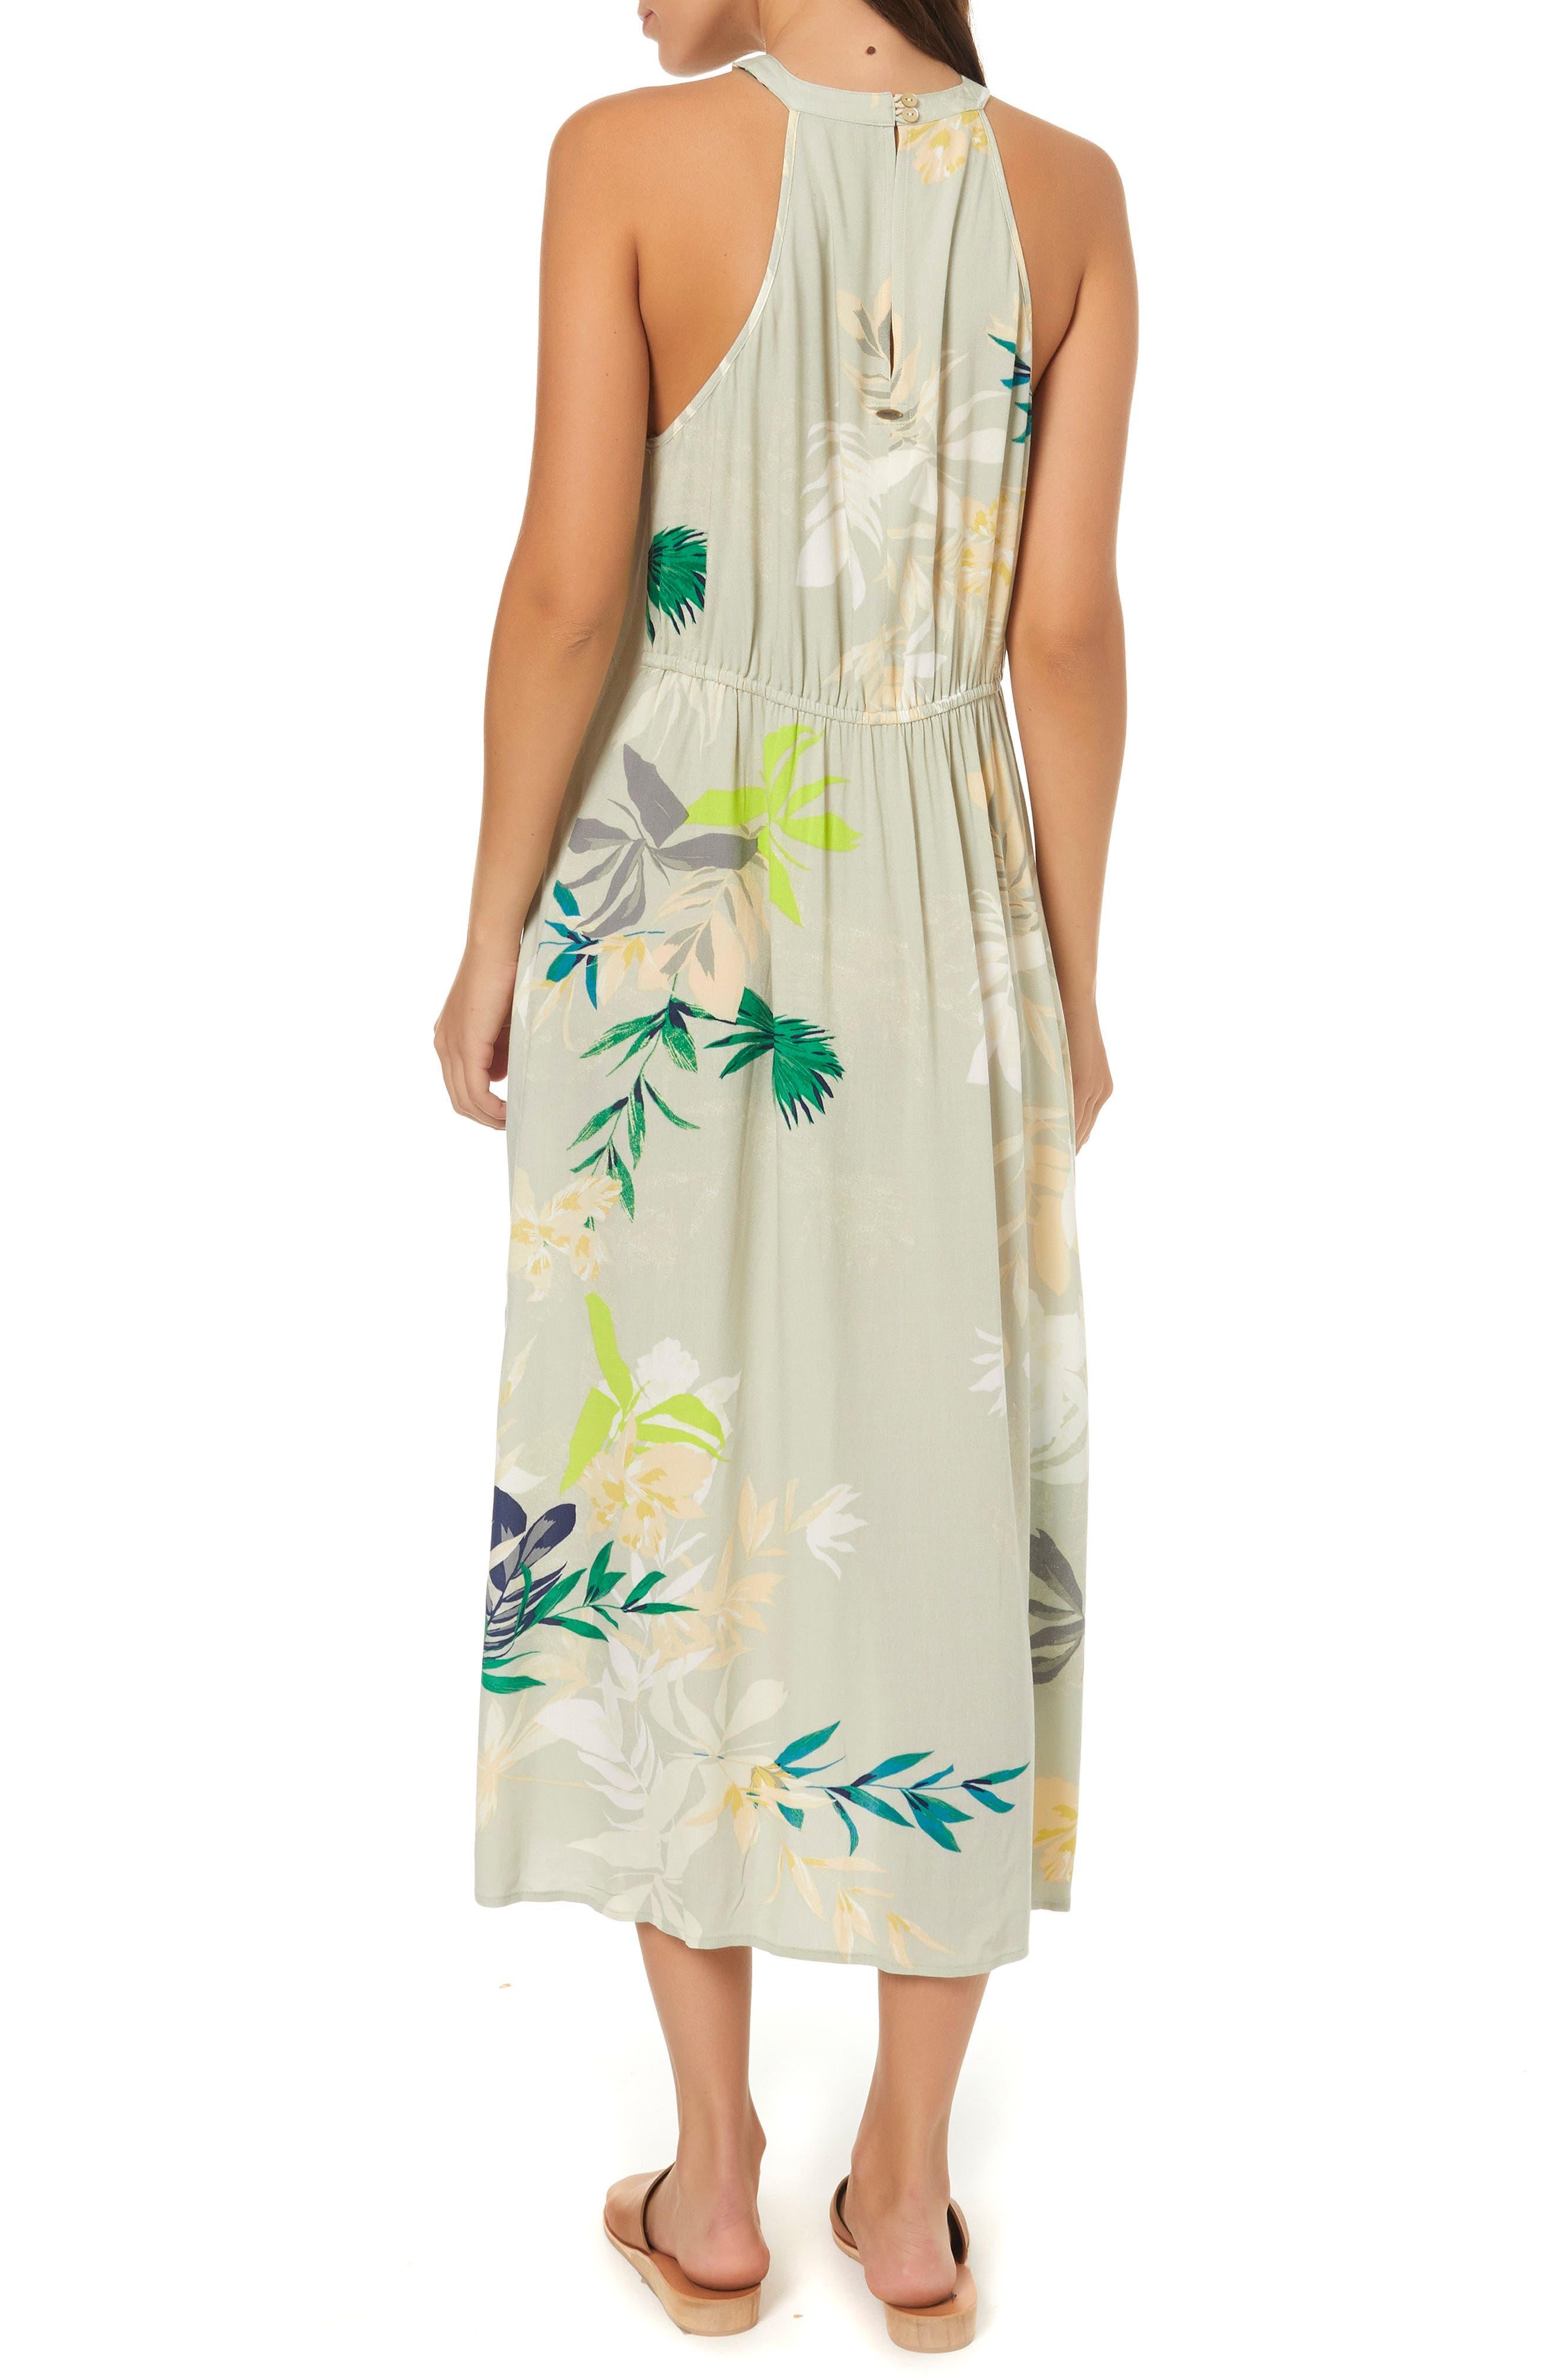 Byronne Floral Print Woven Midi Dress,                             Alternate thumbnail 2, color,                             MULTI COLORED